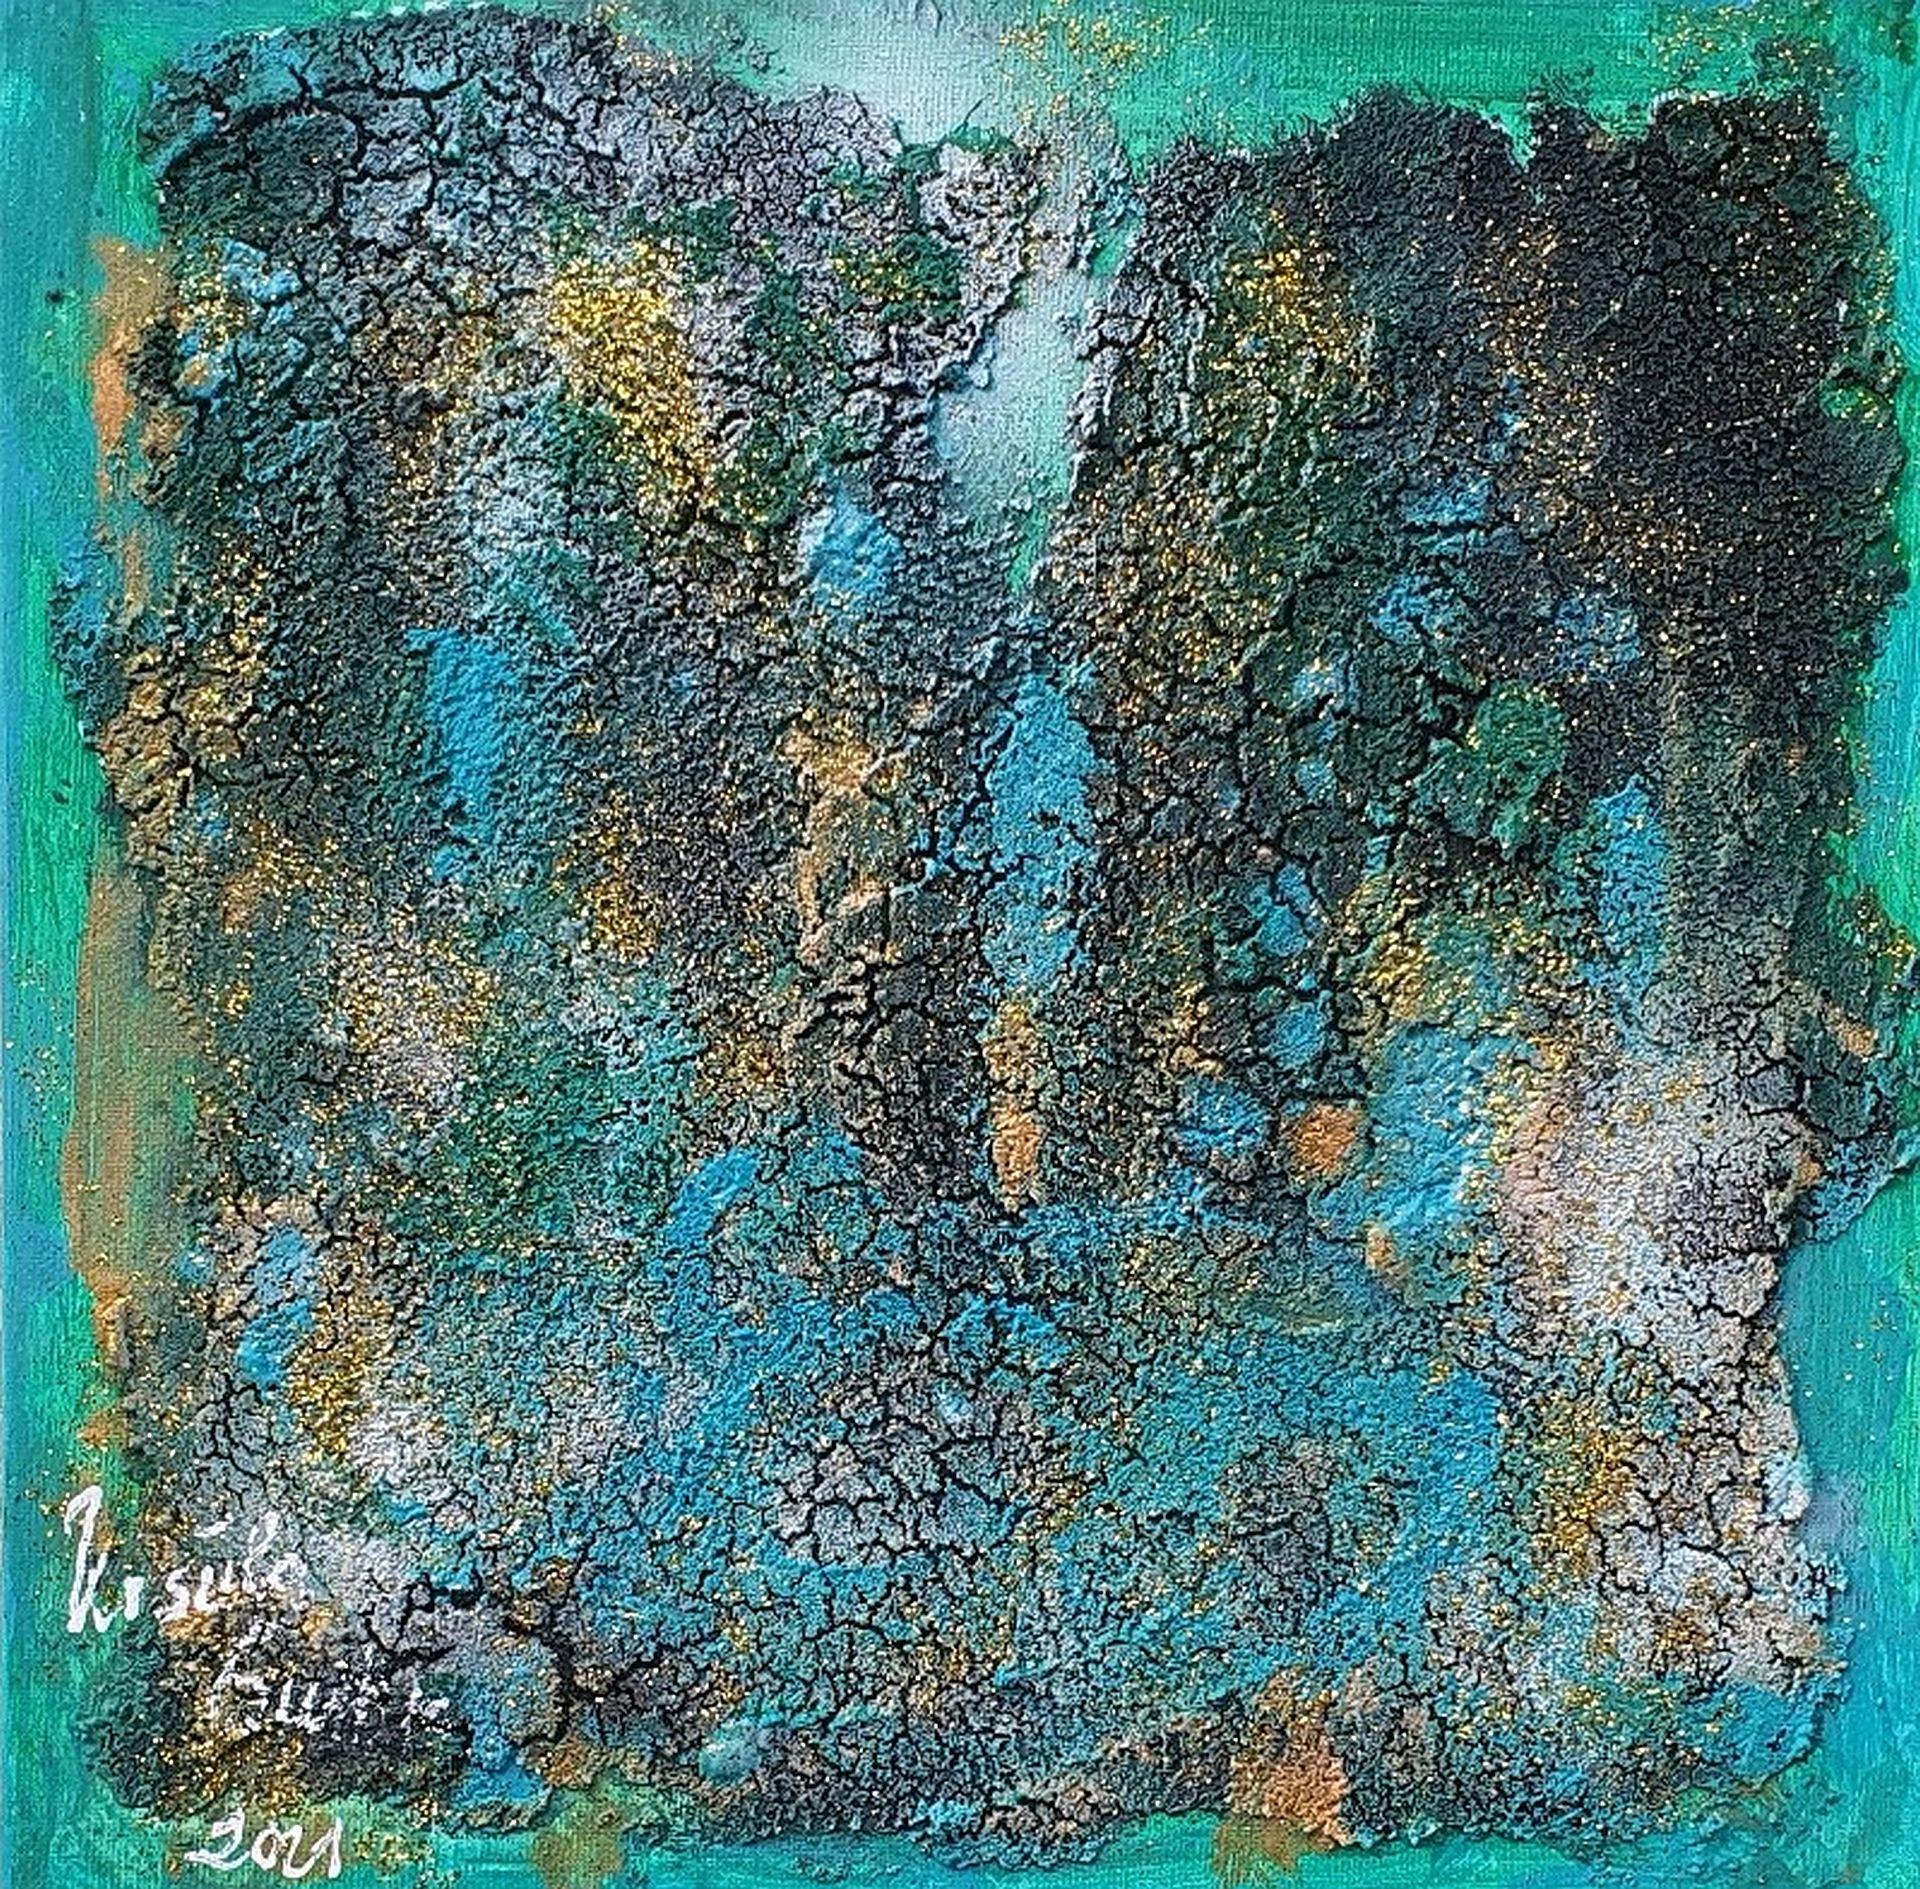 light in the jungle (Acryl on Canvas 29 X 29 X 3 cm)